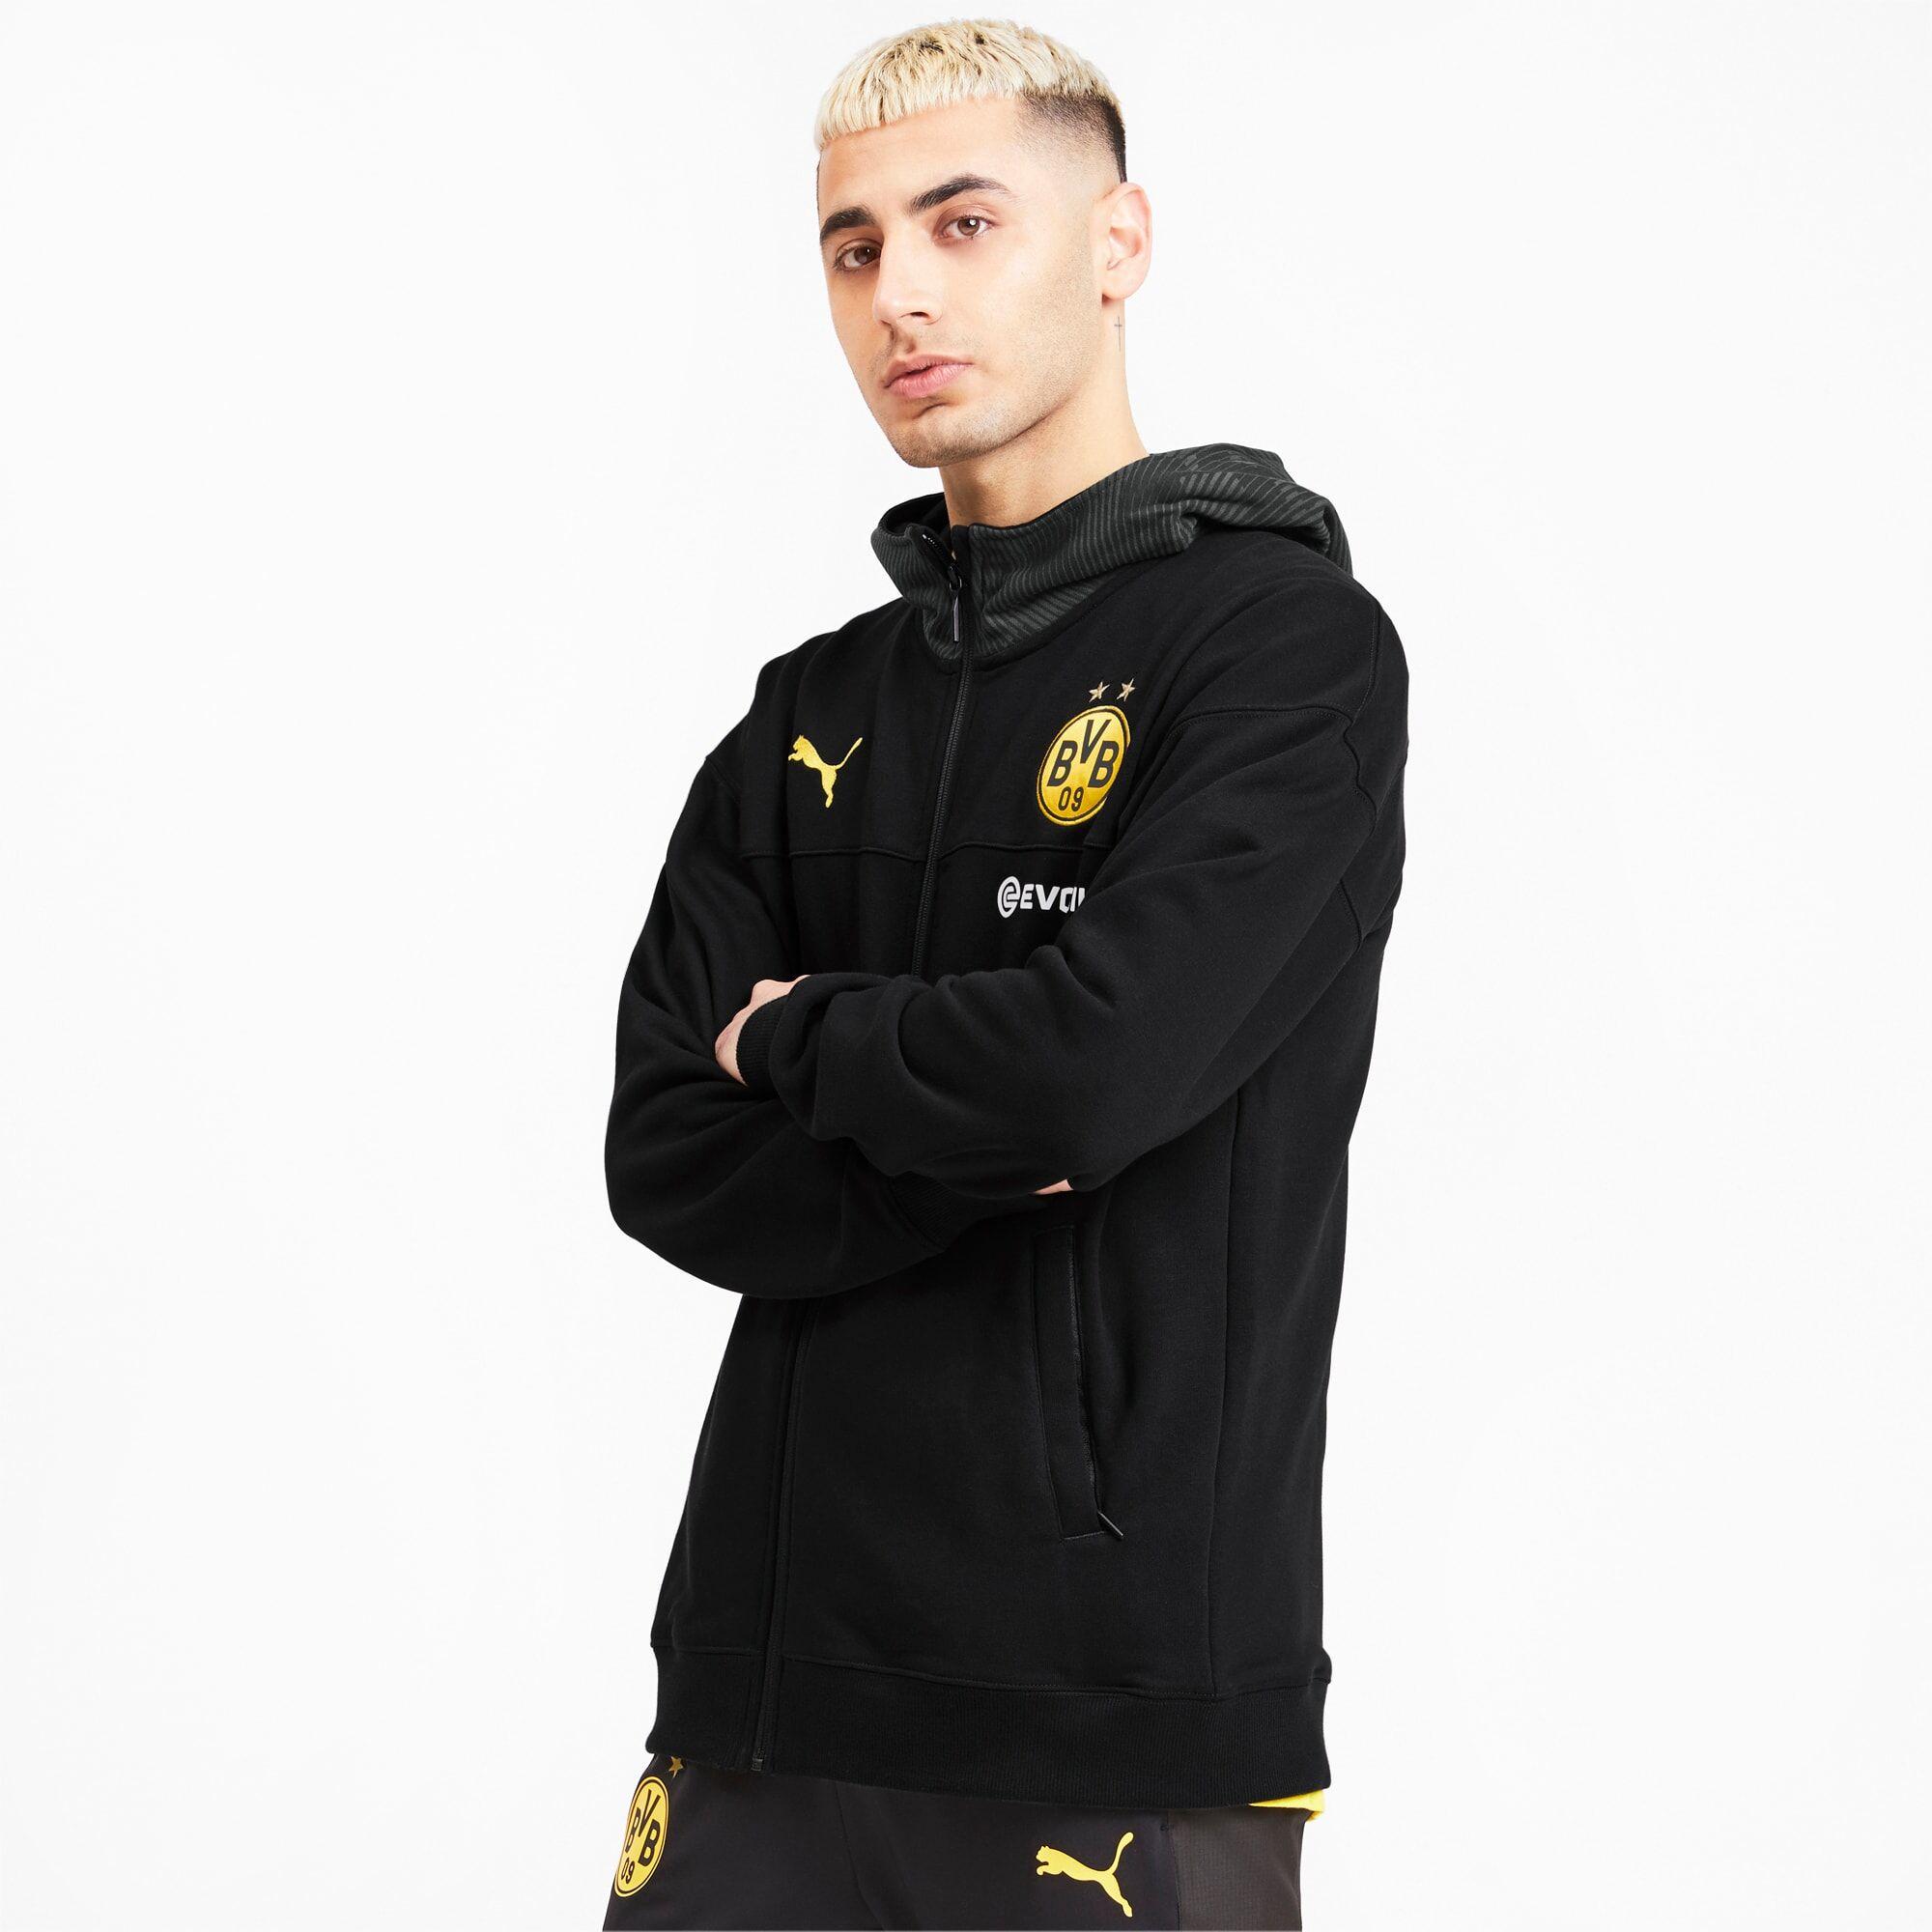 Puma BVB Casuals Men's Jacket,  Black/Phantom Black, size X Large, Clothing